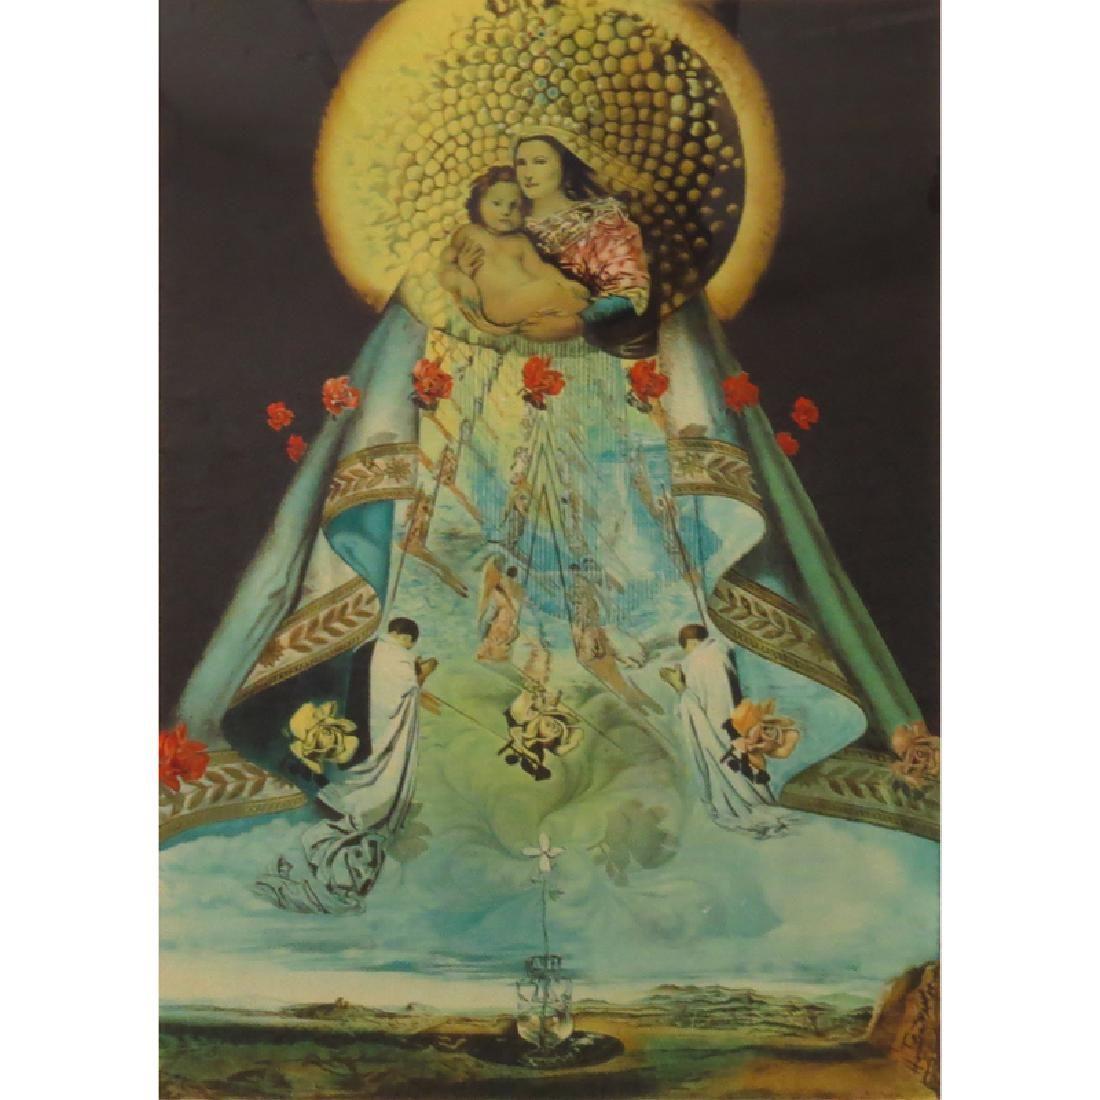 Salvador Dalí, Spanish (1904-1989) Color Lithograph,